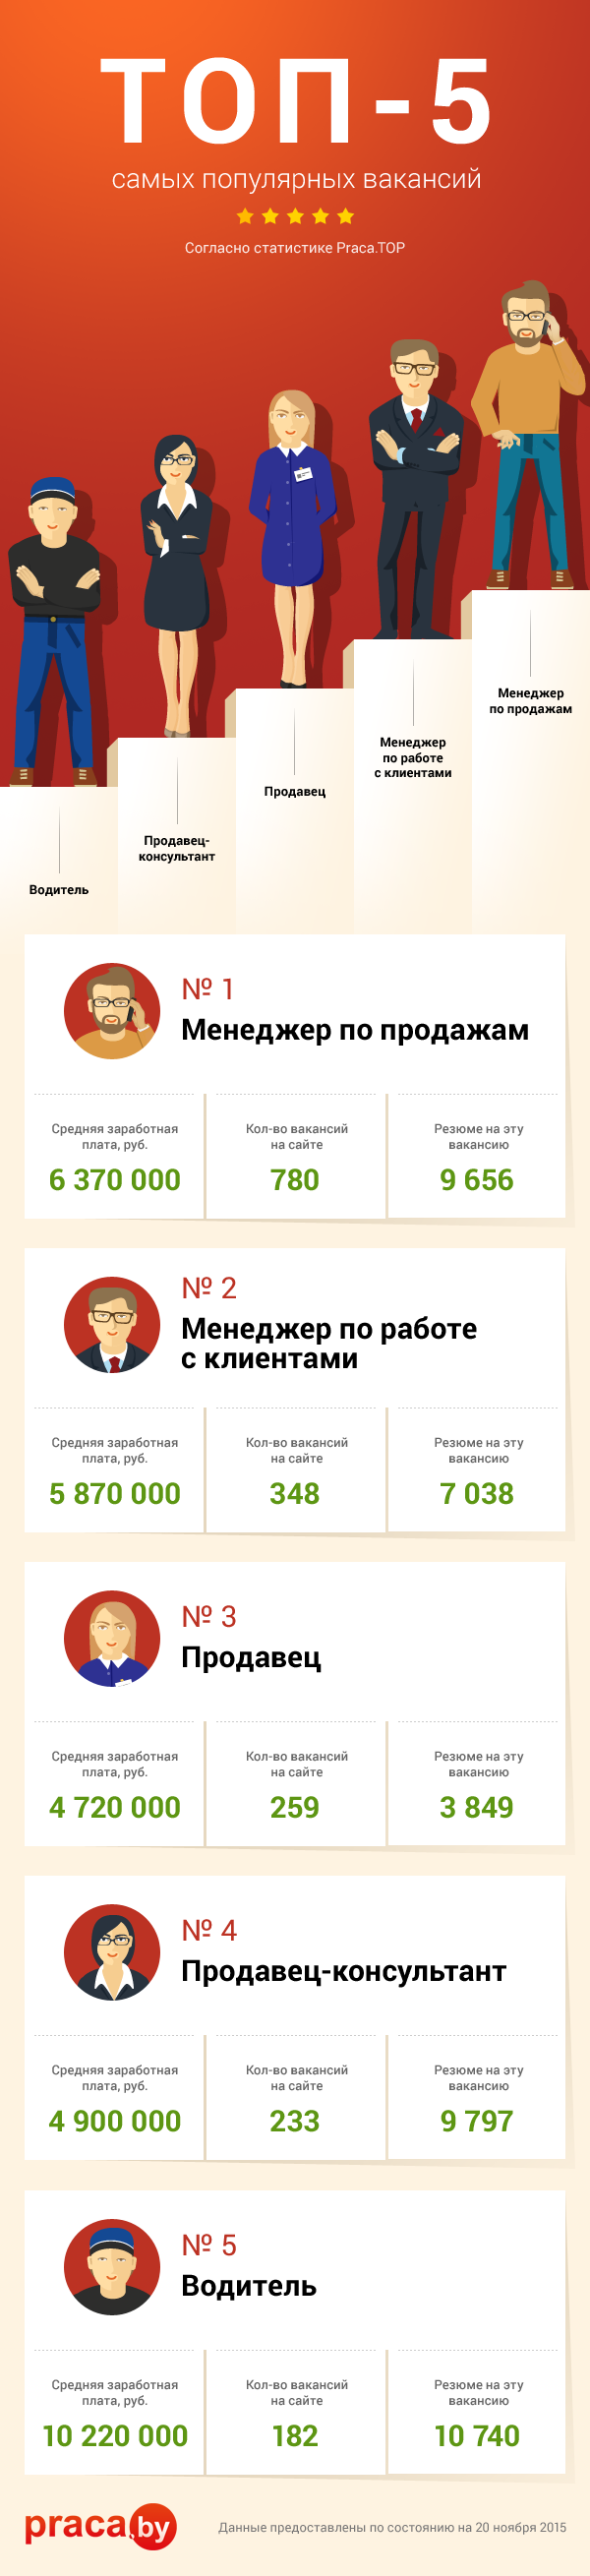 ТОП-5 вакансий на praca.by